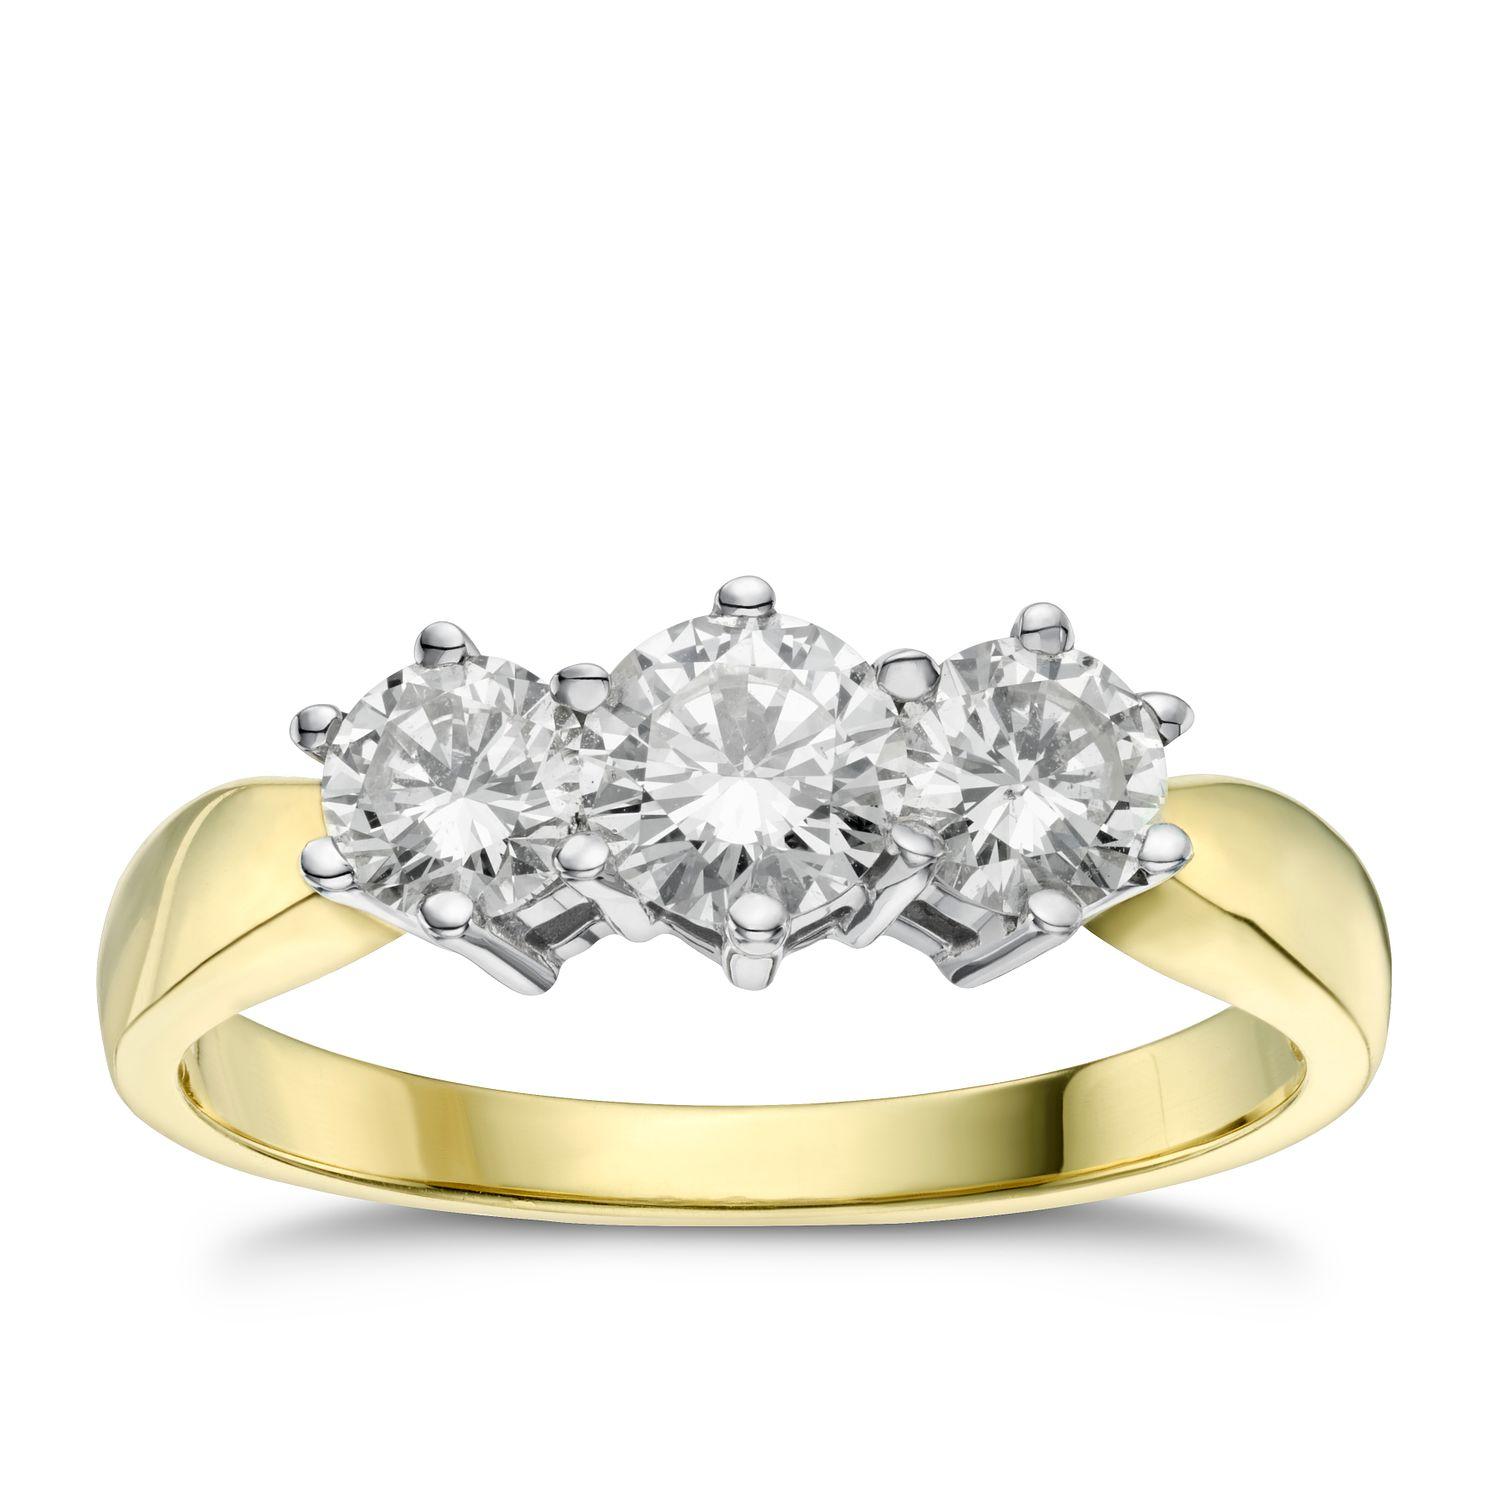 Three Stone Engagement Rings - Diamond Rings - Ernest Jones